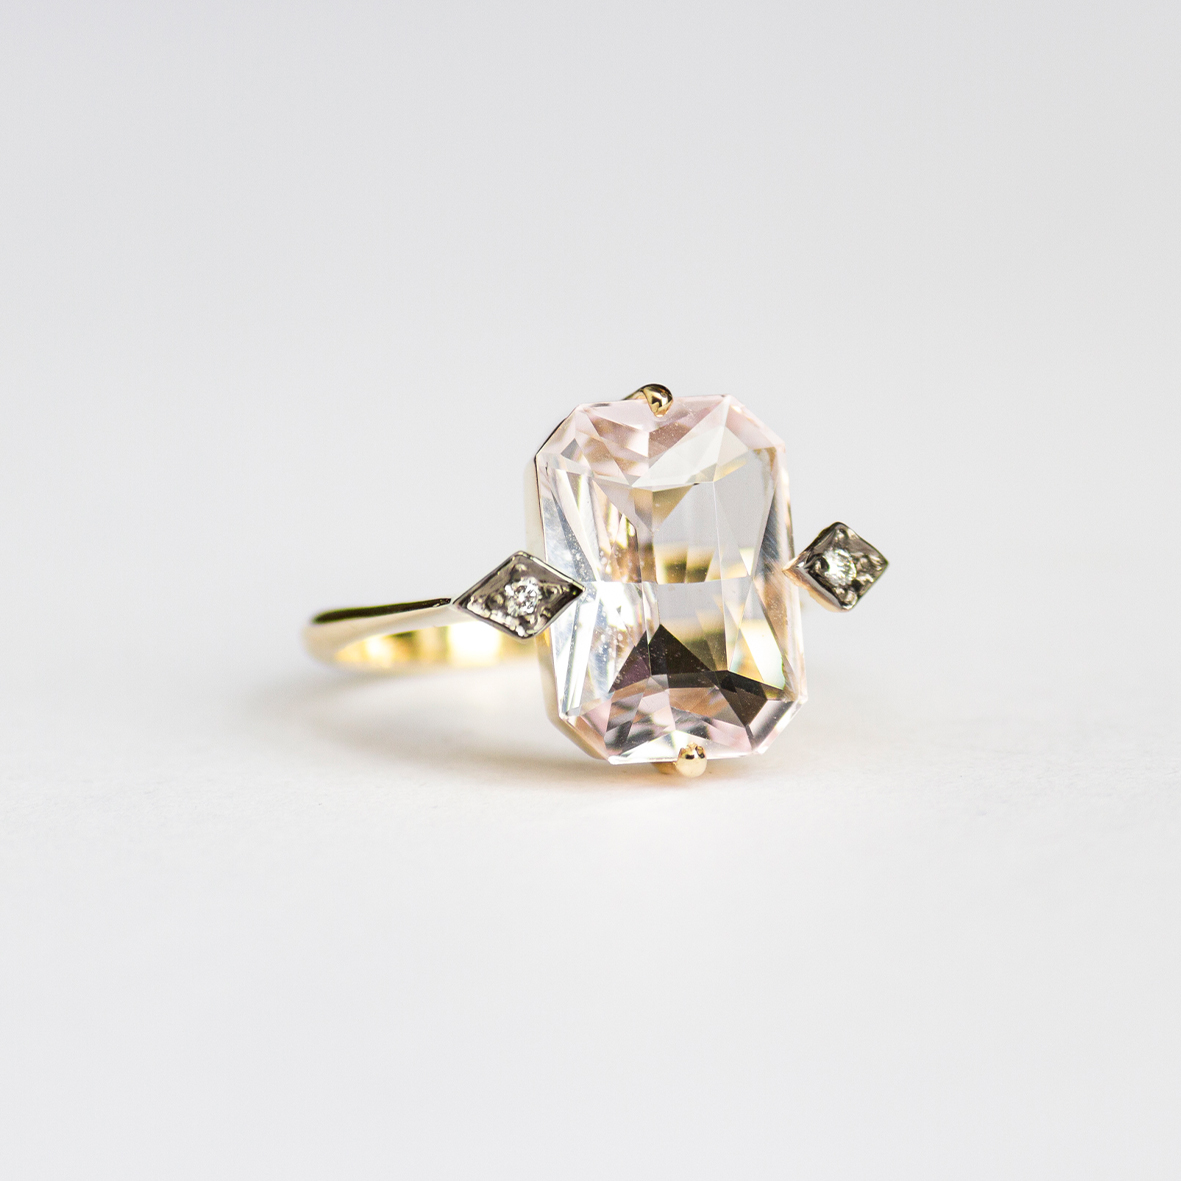 2. OONA_gems of ceylon_ficha1_morganite ring